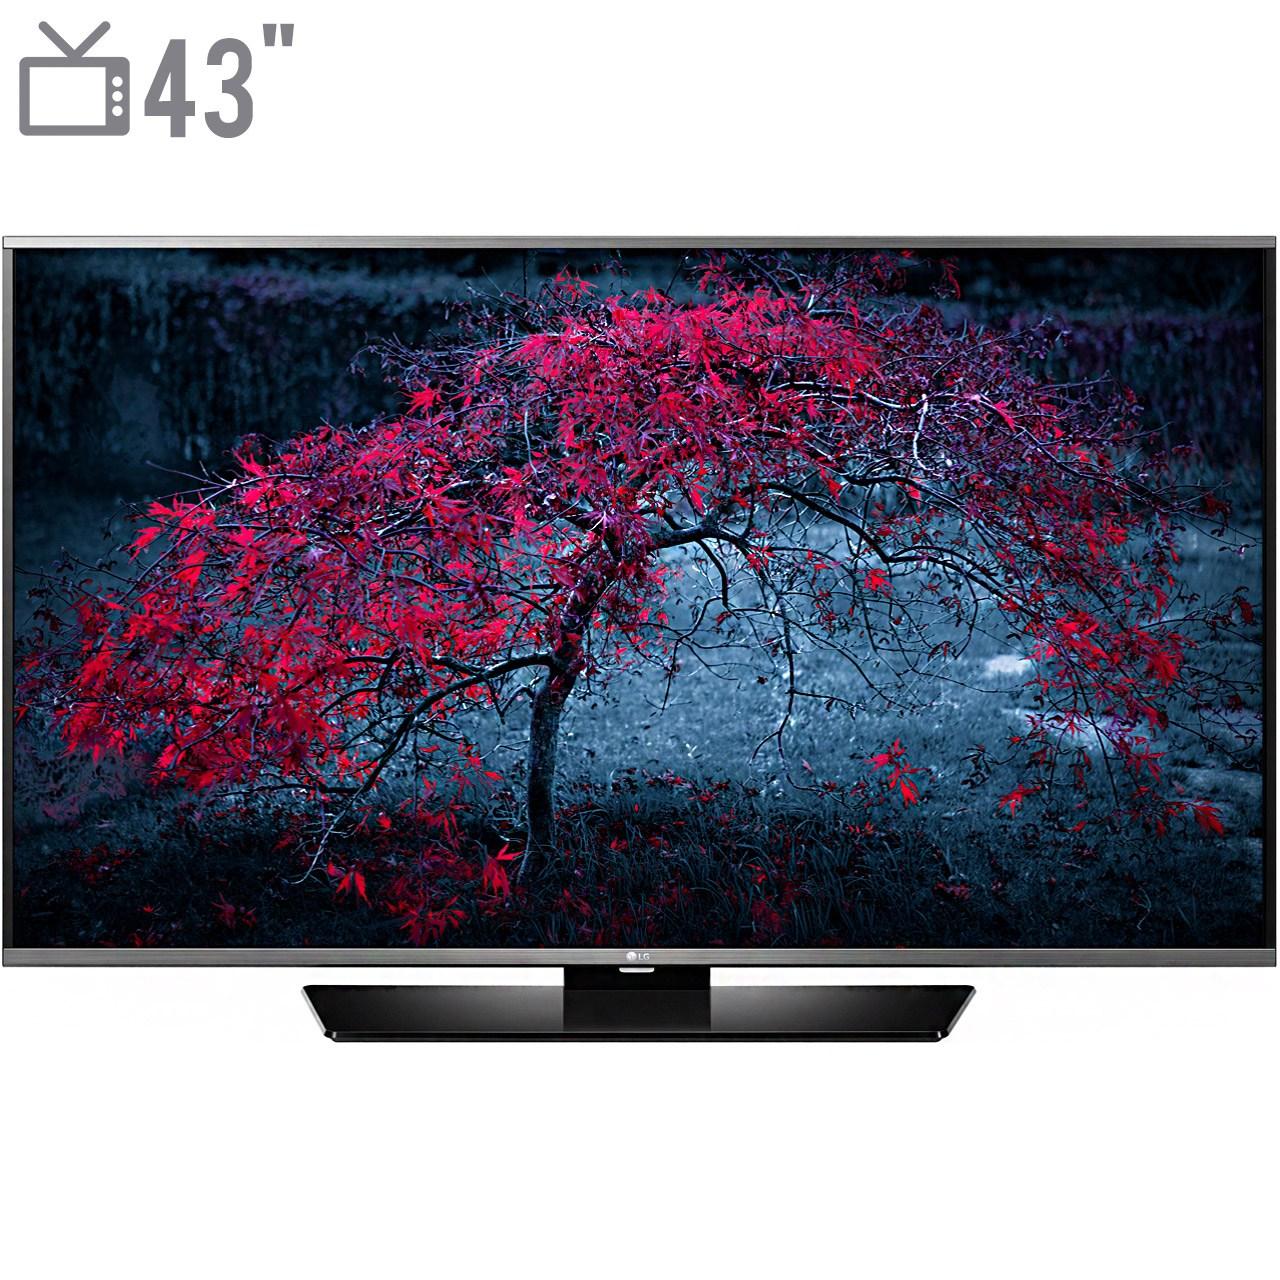 تلویزیون ال ای دی هوشمند ال جی مدل 43LF63000GI سایز 43 اینچ | LG 43LF63000GI Smart LED TV 43 Inch